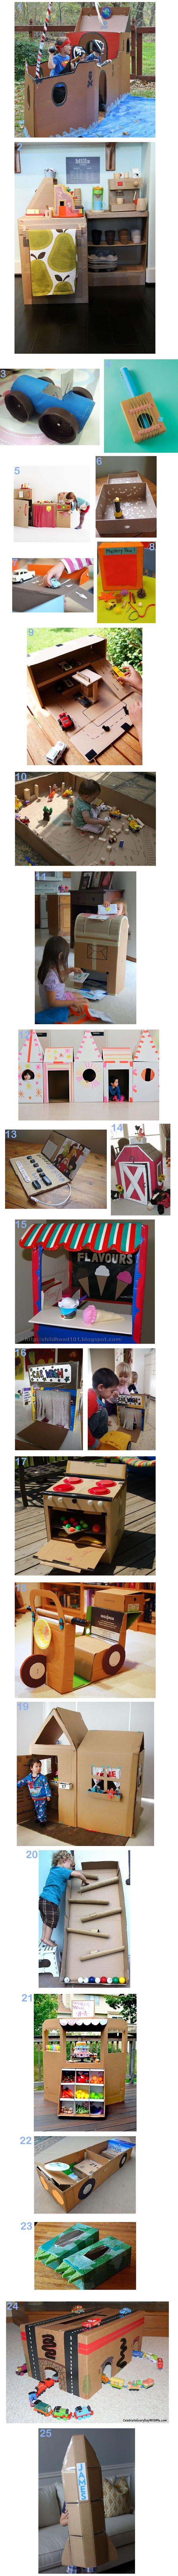 25 Fun Ideas for a Cardboard Box